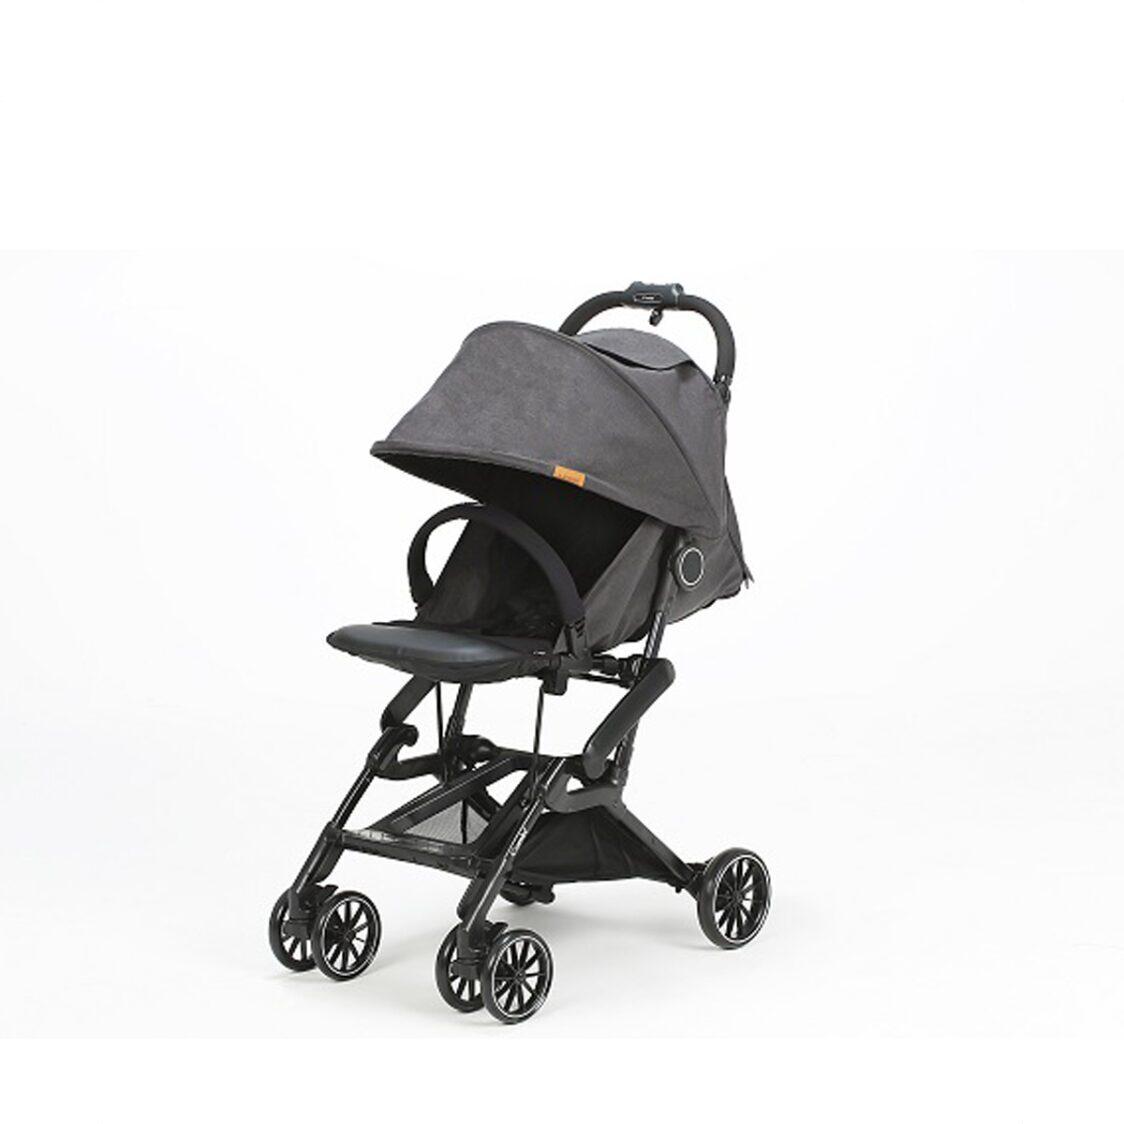 Combi CFS Charcoal Black Compact Folding Stroller 136 Months 6KG